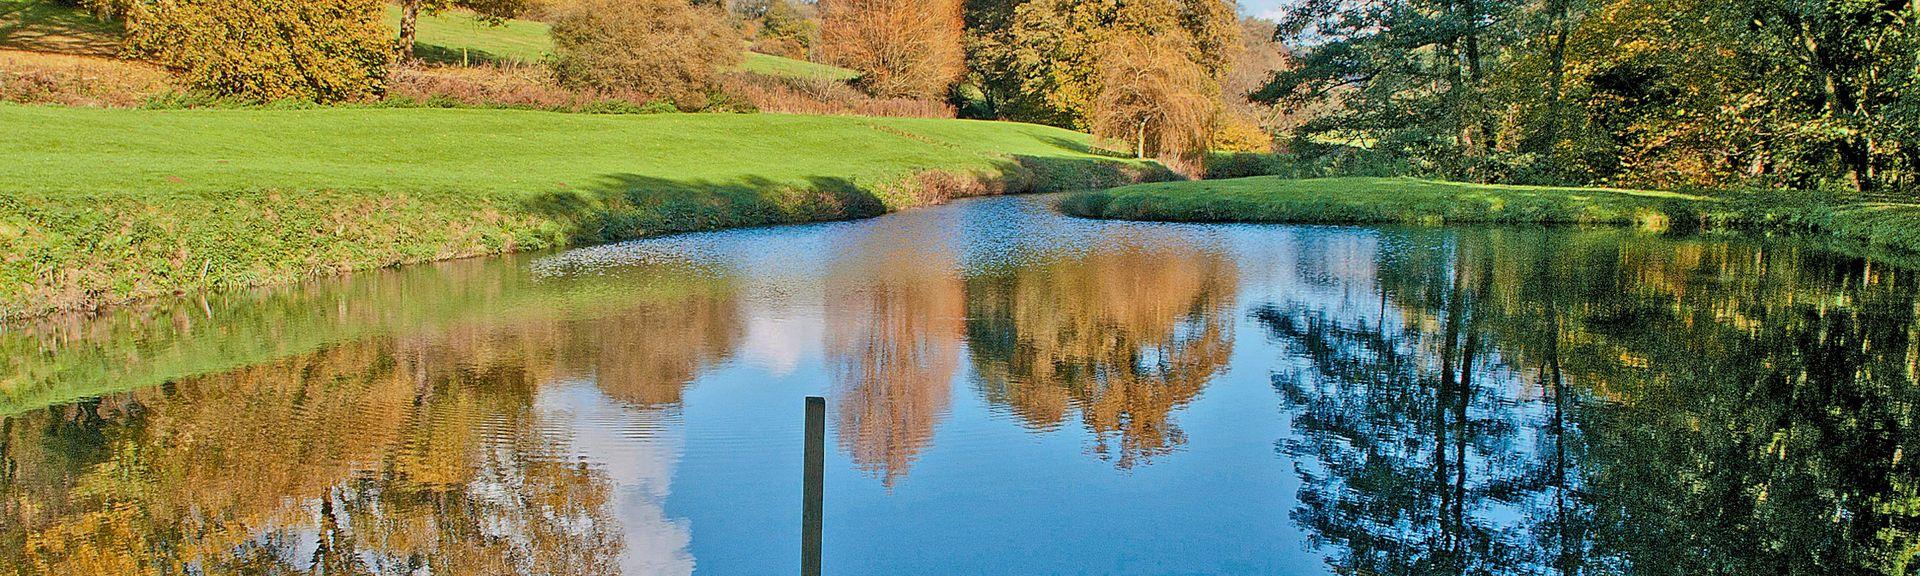 Wiltshire, Inglaterra, Reino Unido